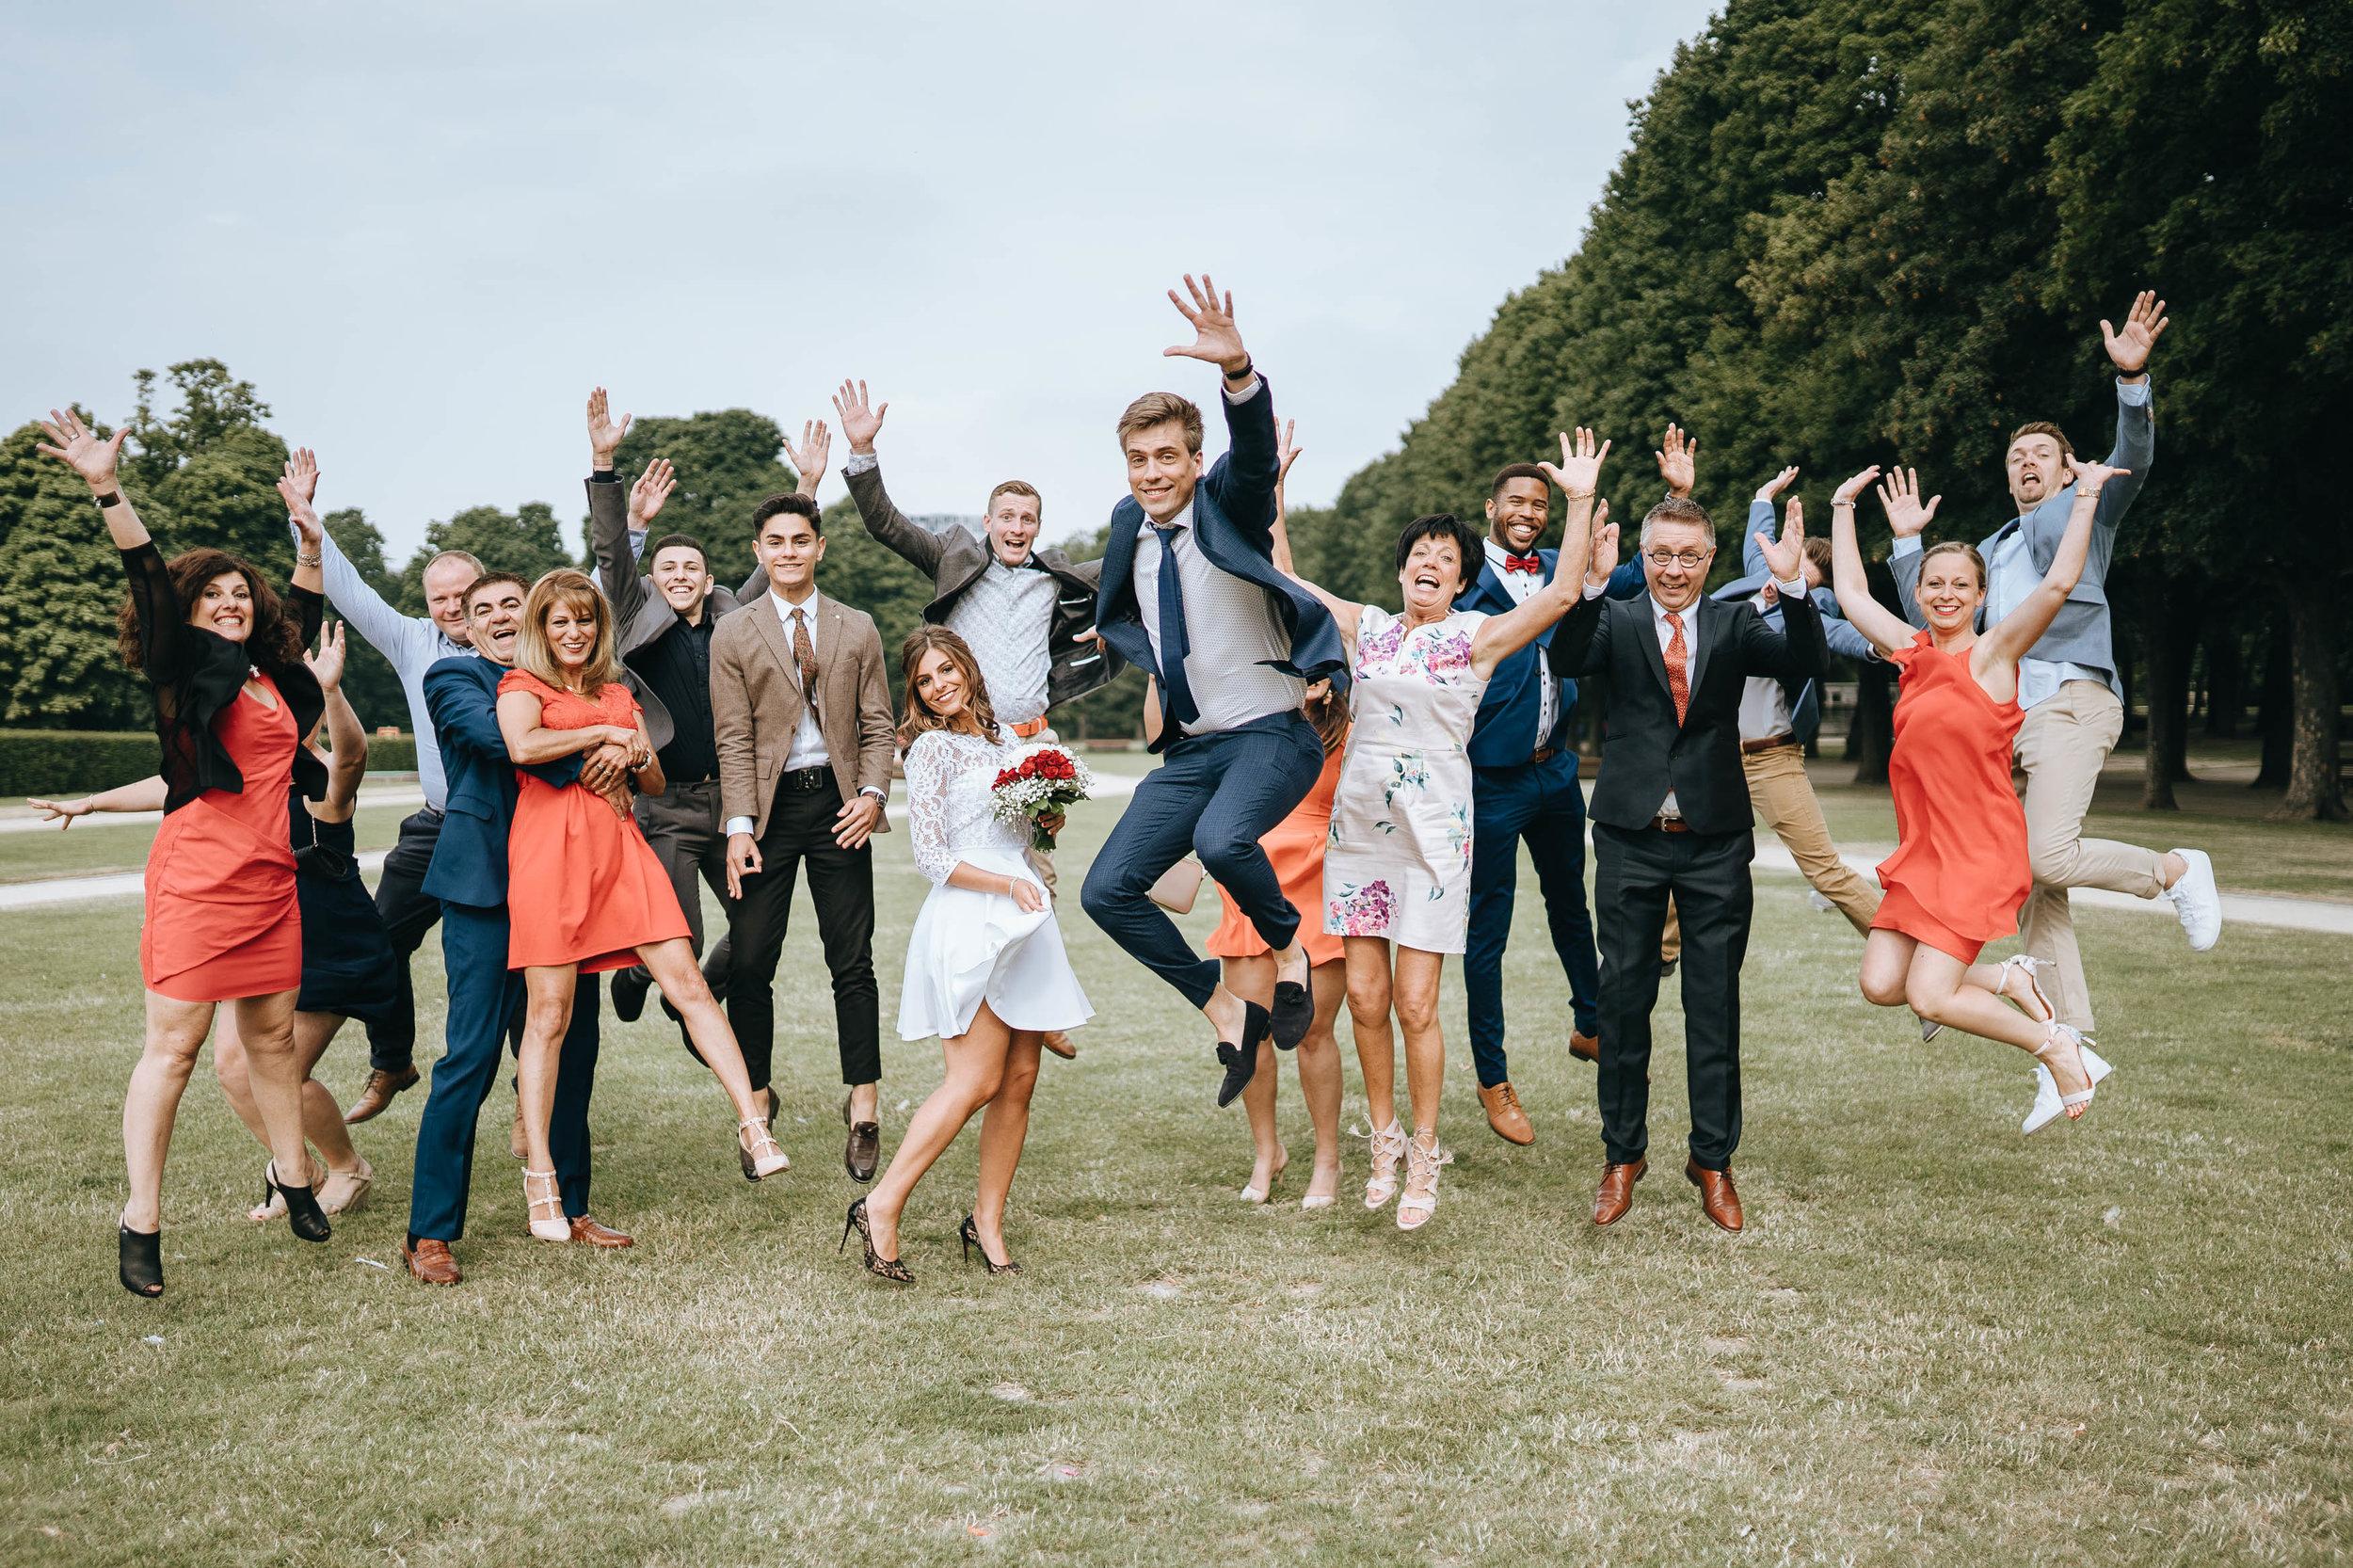 photographe_bruxelles_mariage_cinquantenaire-9.jpg